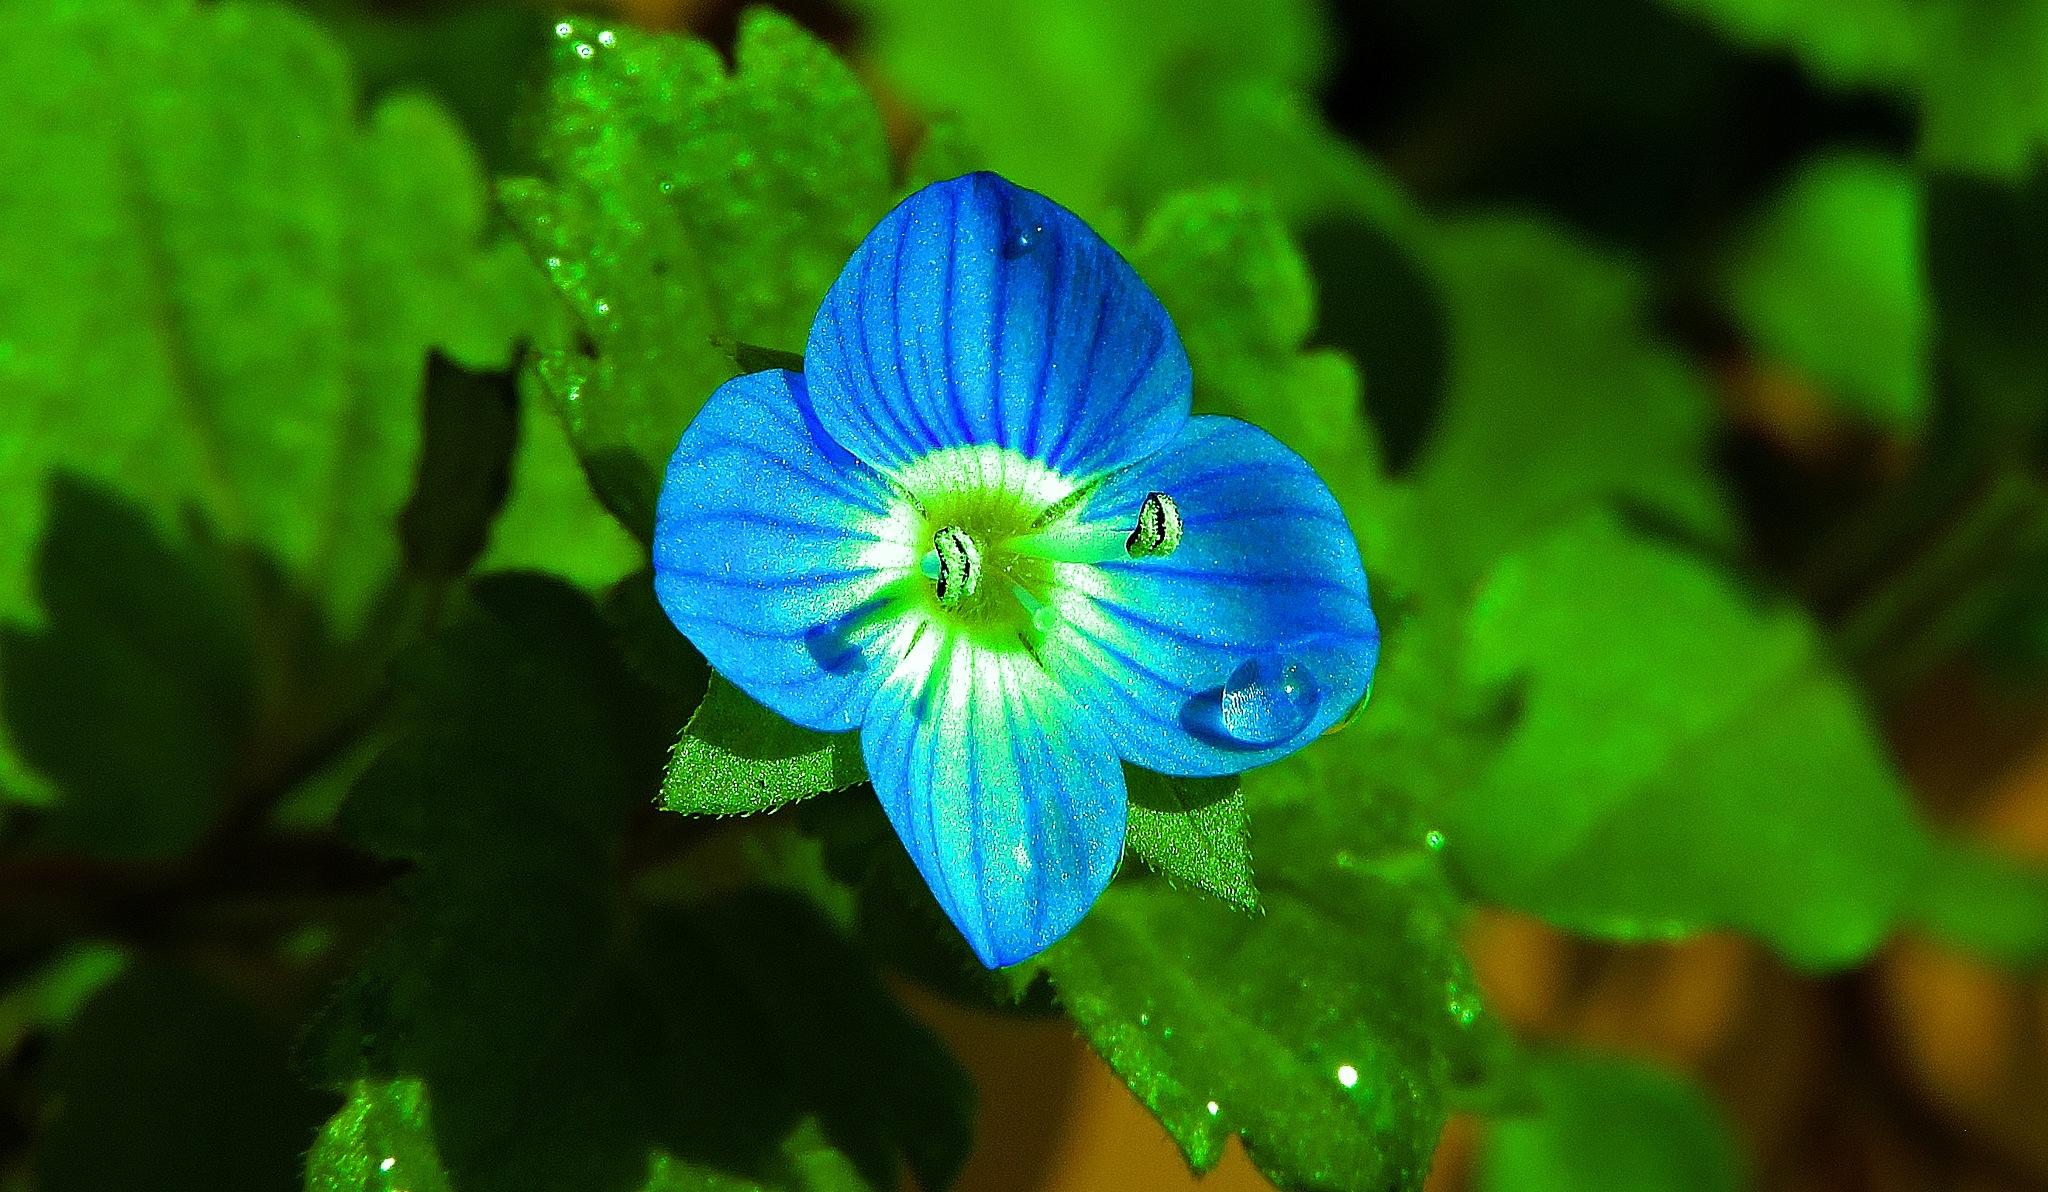 flower by bilal güldoğan